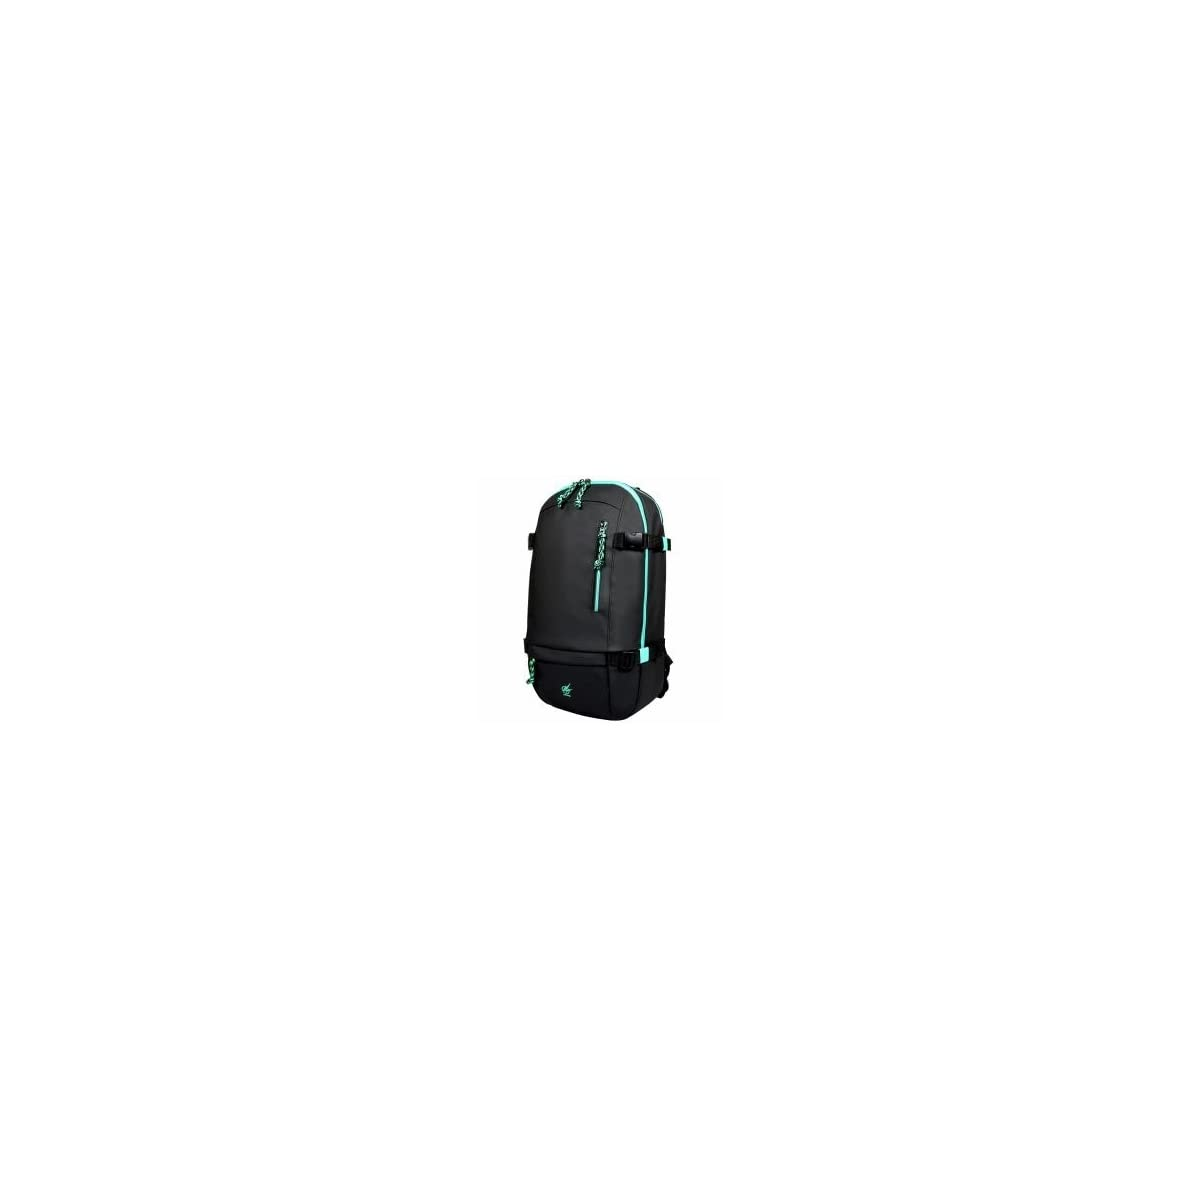 21EgSaC6M2L. SS1200  - Port Arokh BP-1 - Mochila Gaming